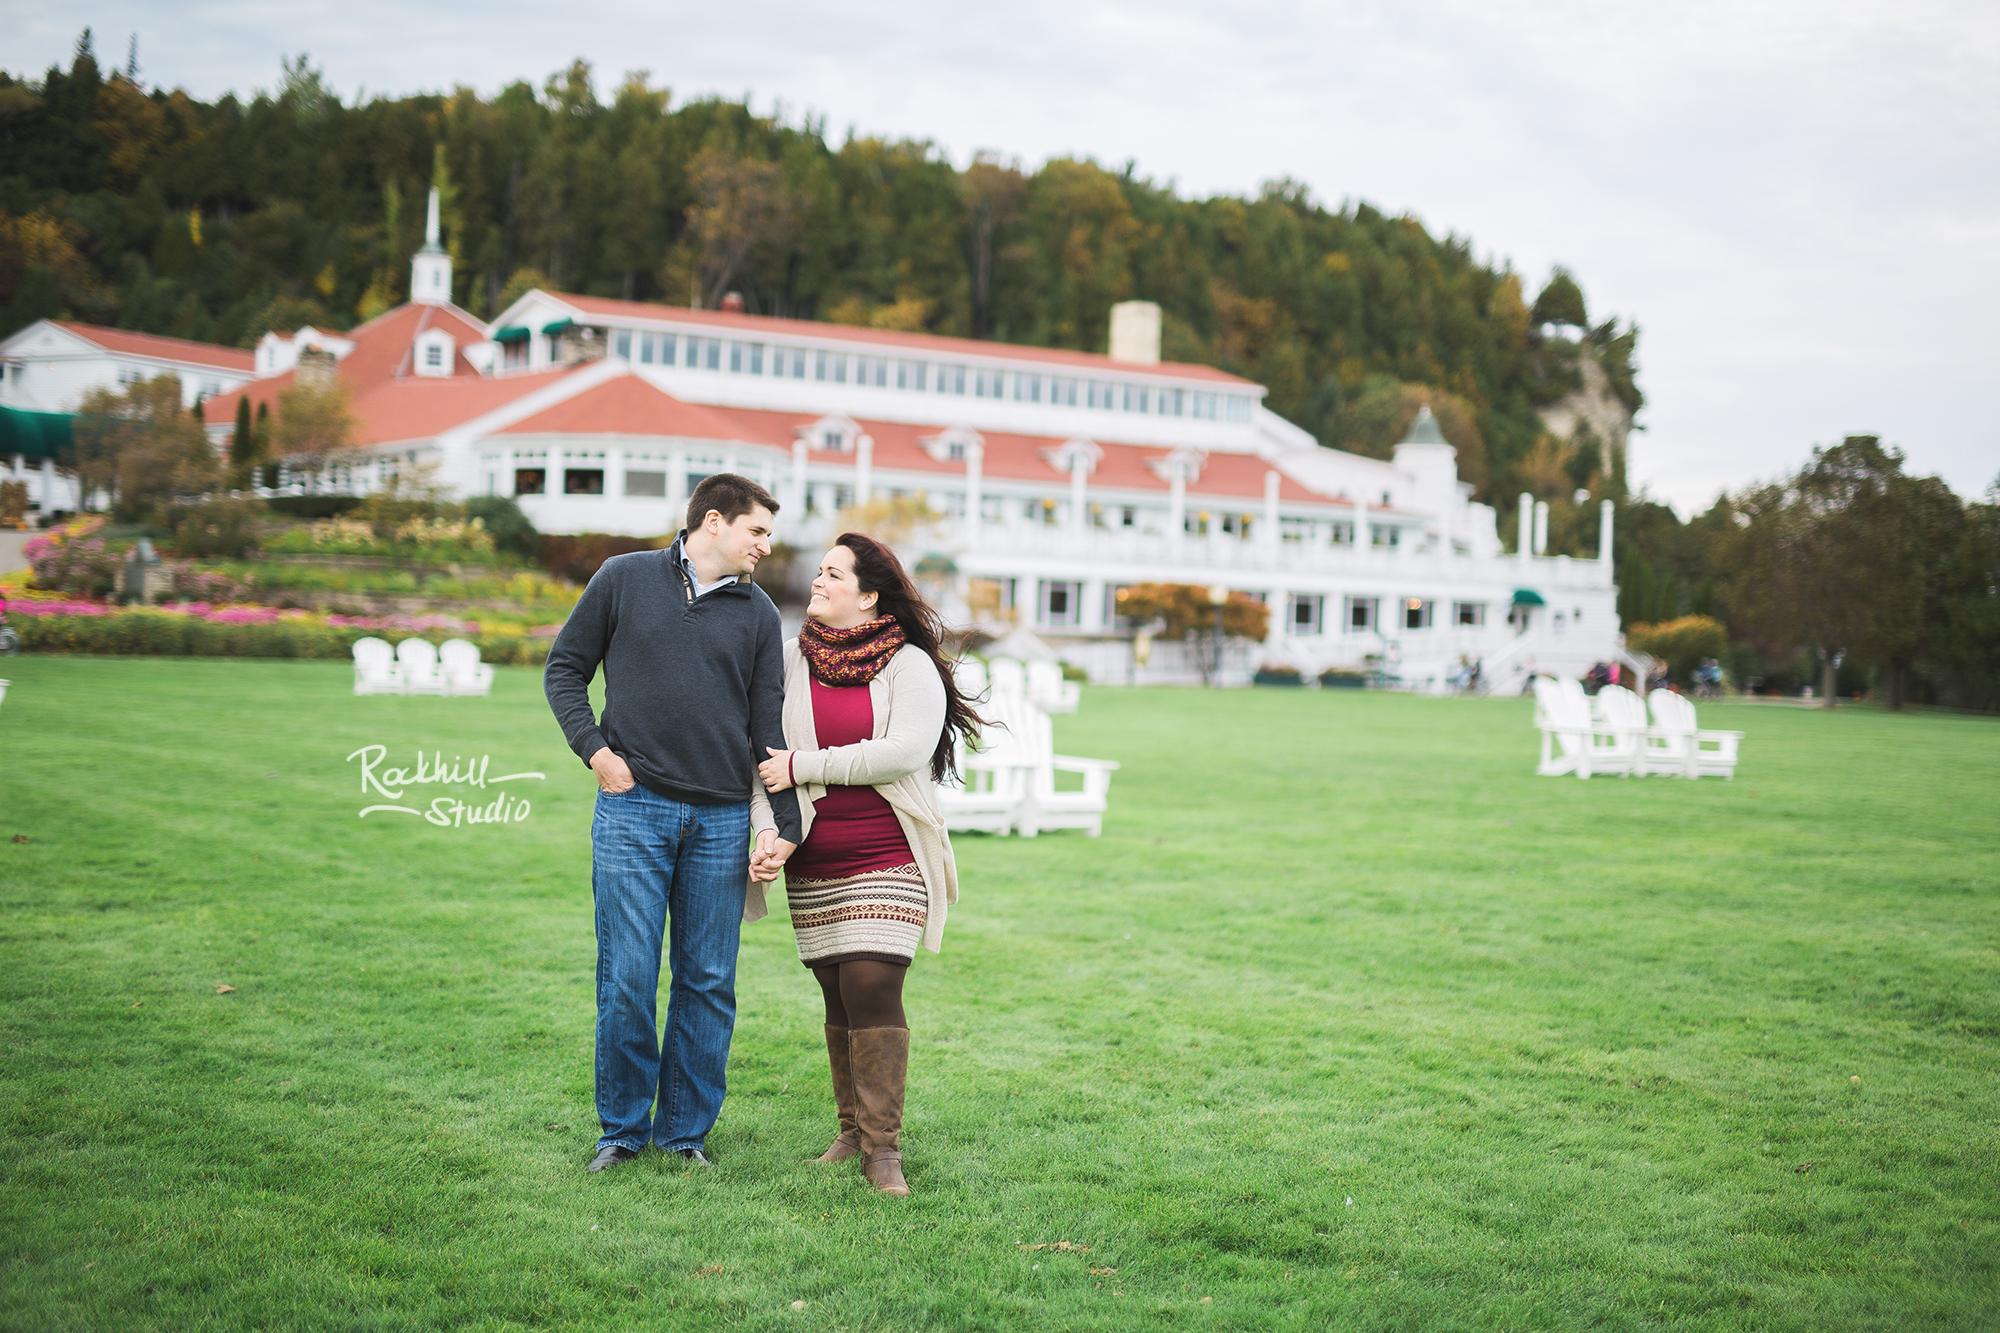 mackinac-island-wedding-engagement-michigan-rockhill-12.jpg